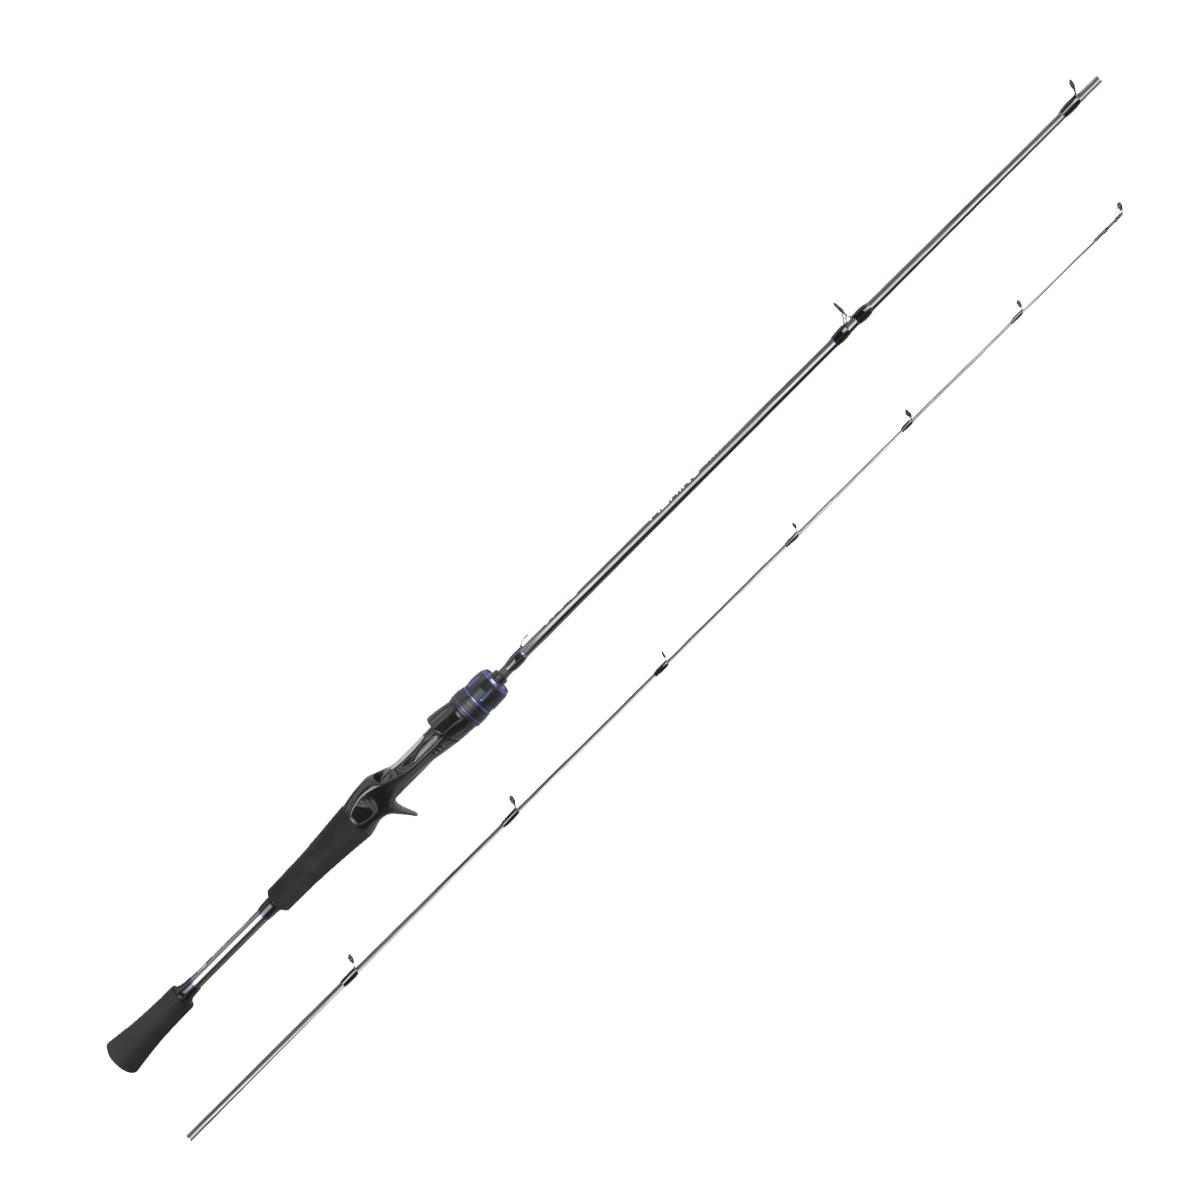 Vara Saint Pro Fishing Titanium P/ Carretilha 5